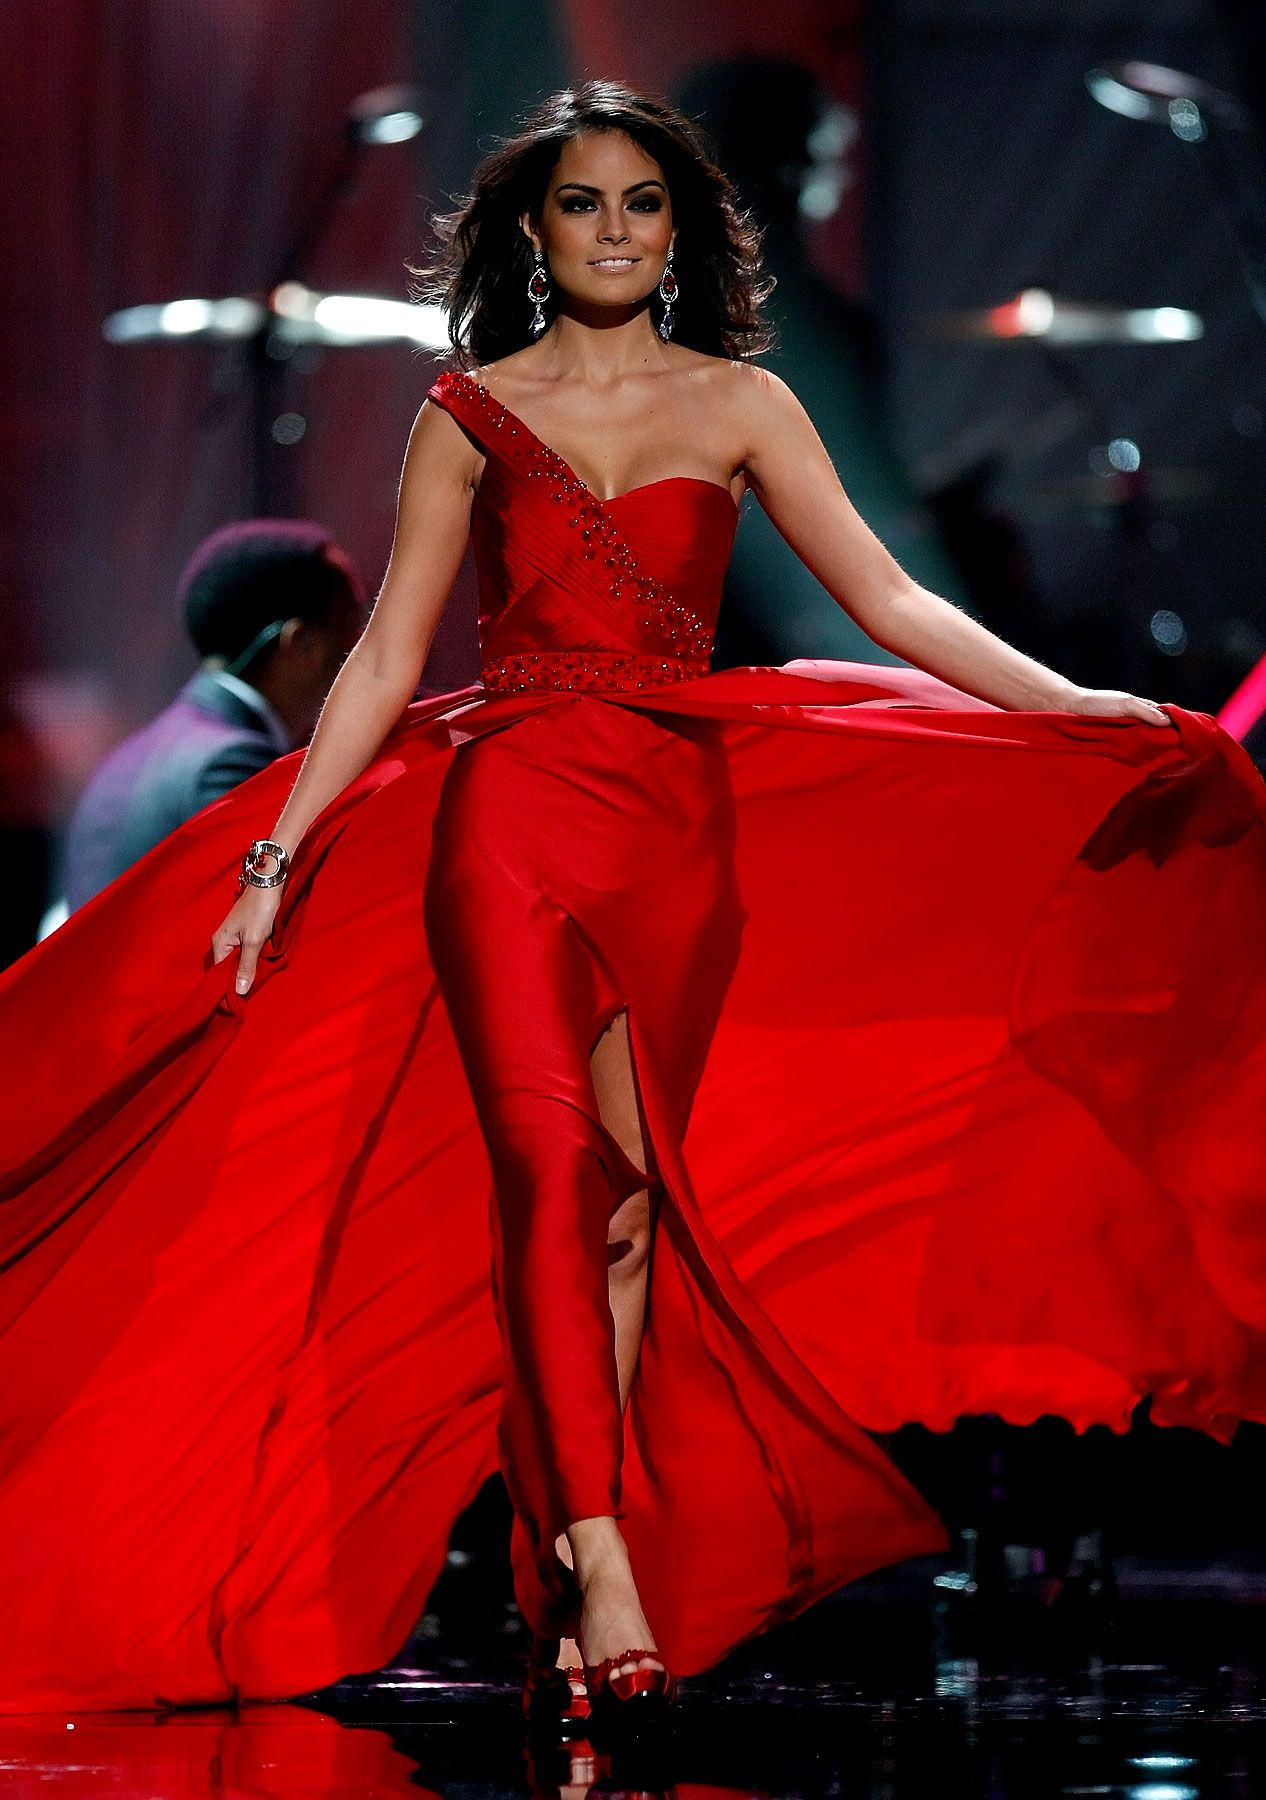 Miss Mexico 2010 Jimena Navarrete | Vestidos de miss, Ximena navarrete,  Vestidos de glamour